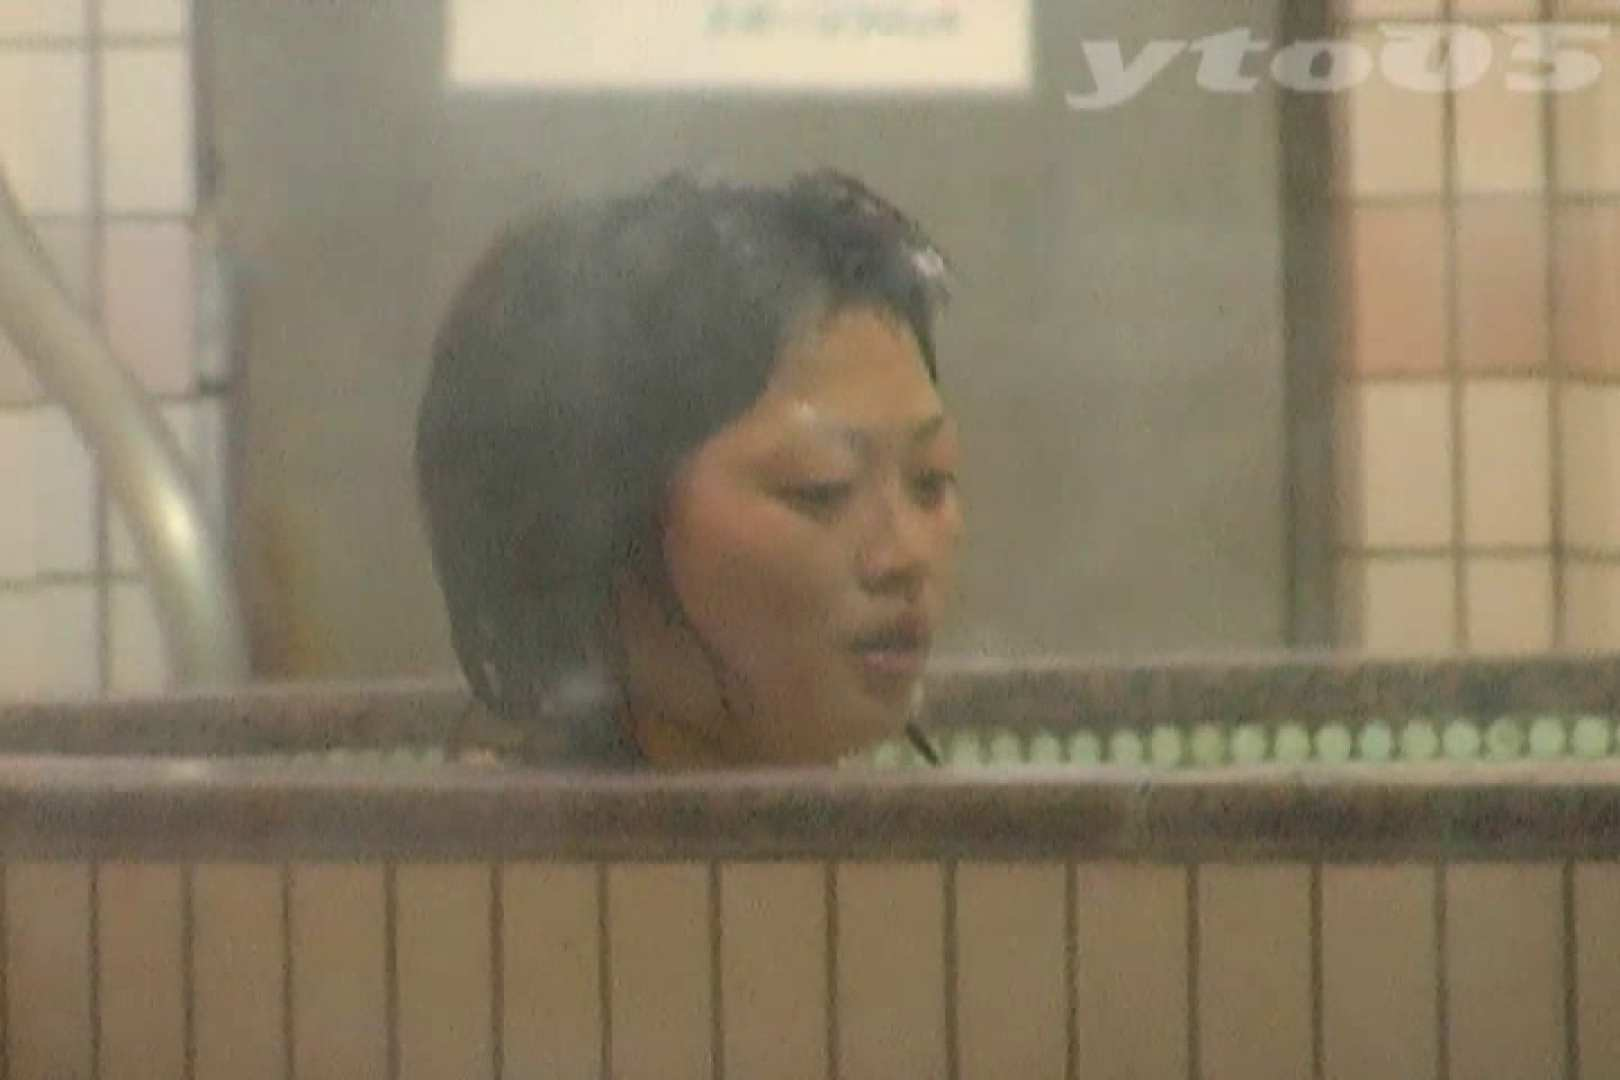 ▲復活限定▲合宿ホテル女風呂盗撮 Vol.28 OL | 合宿  38連発 1